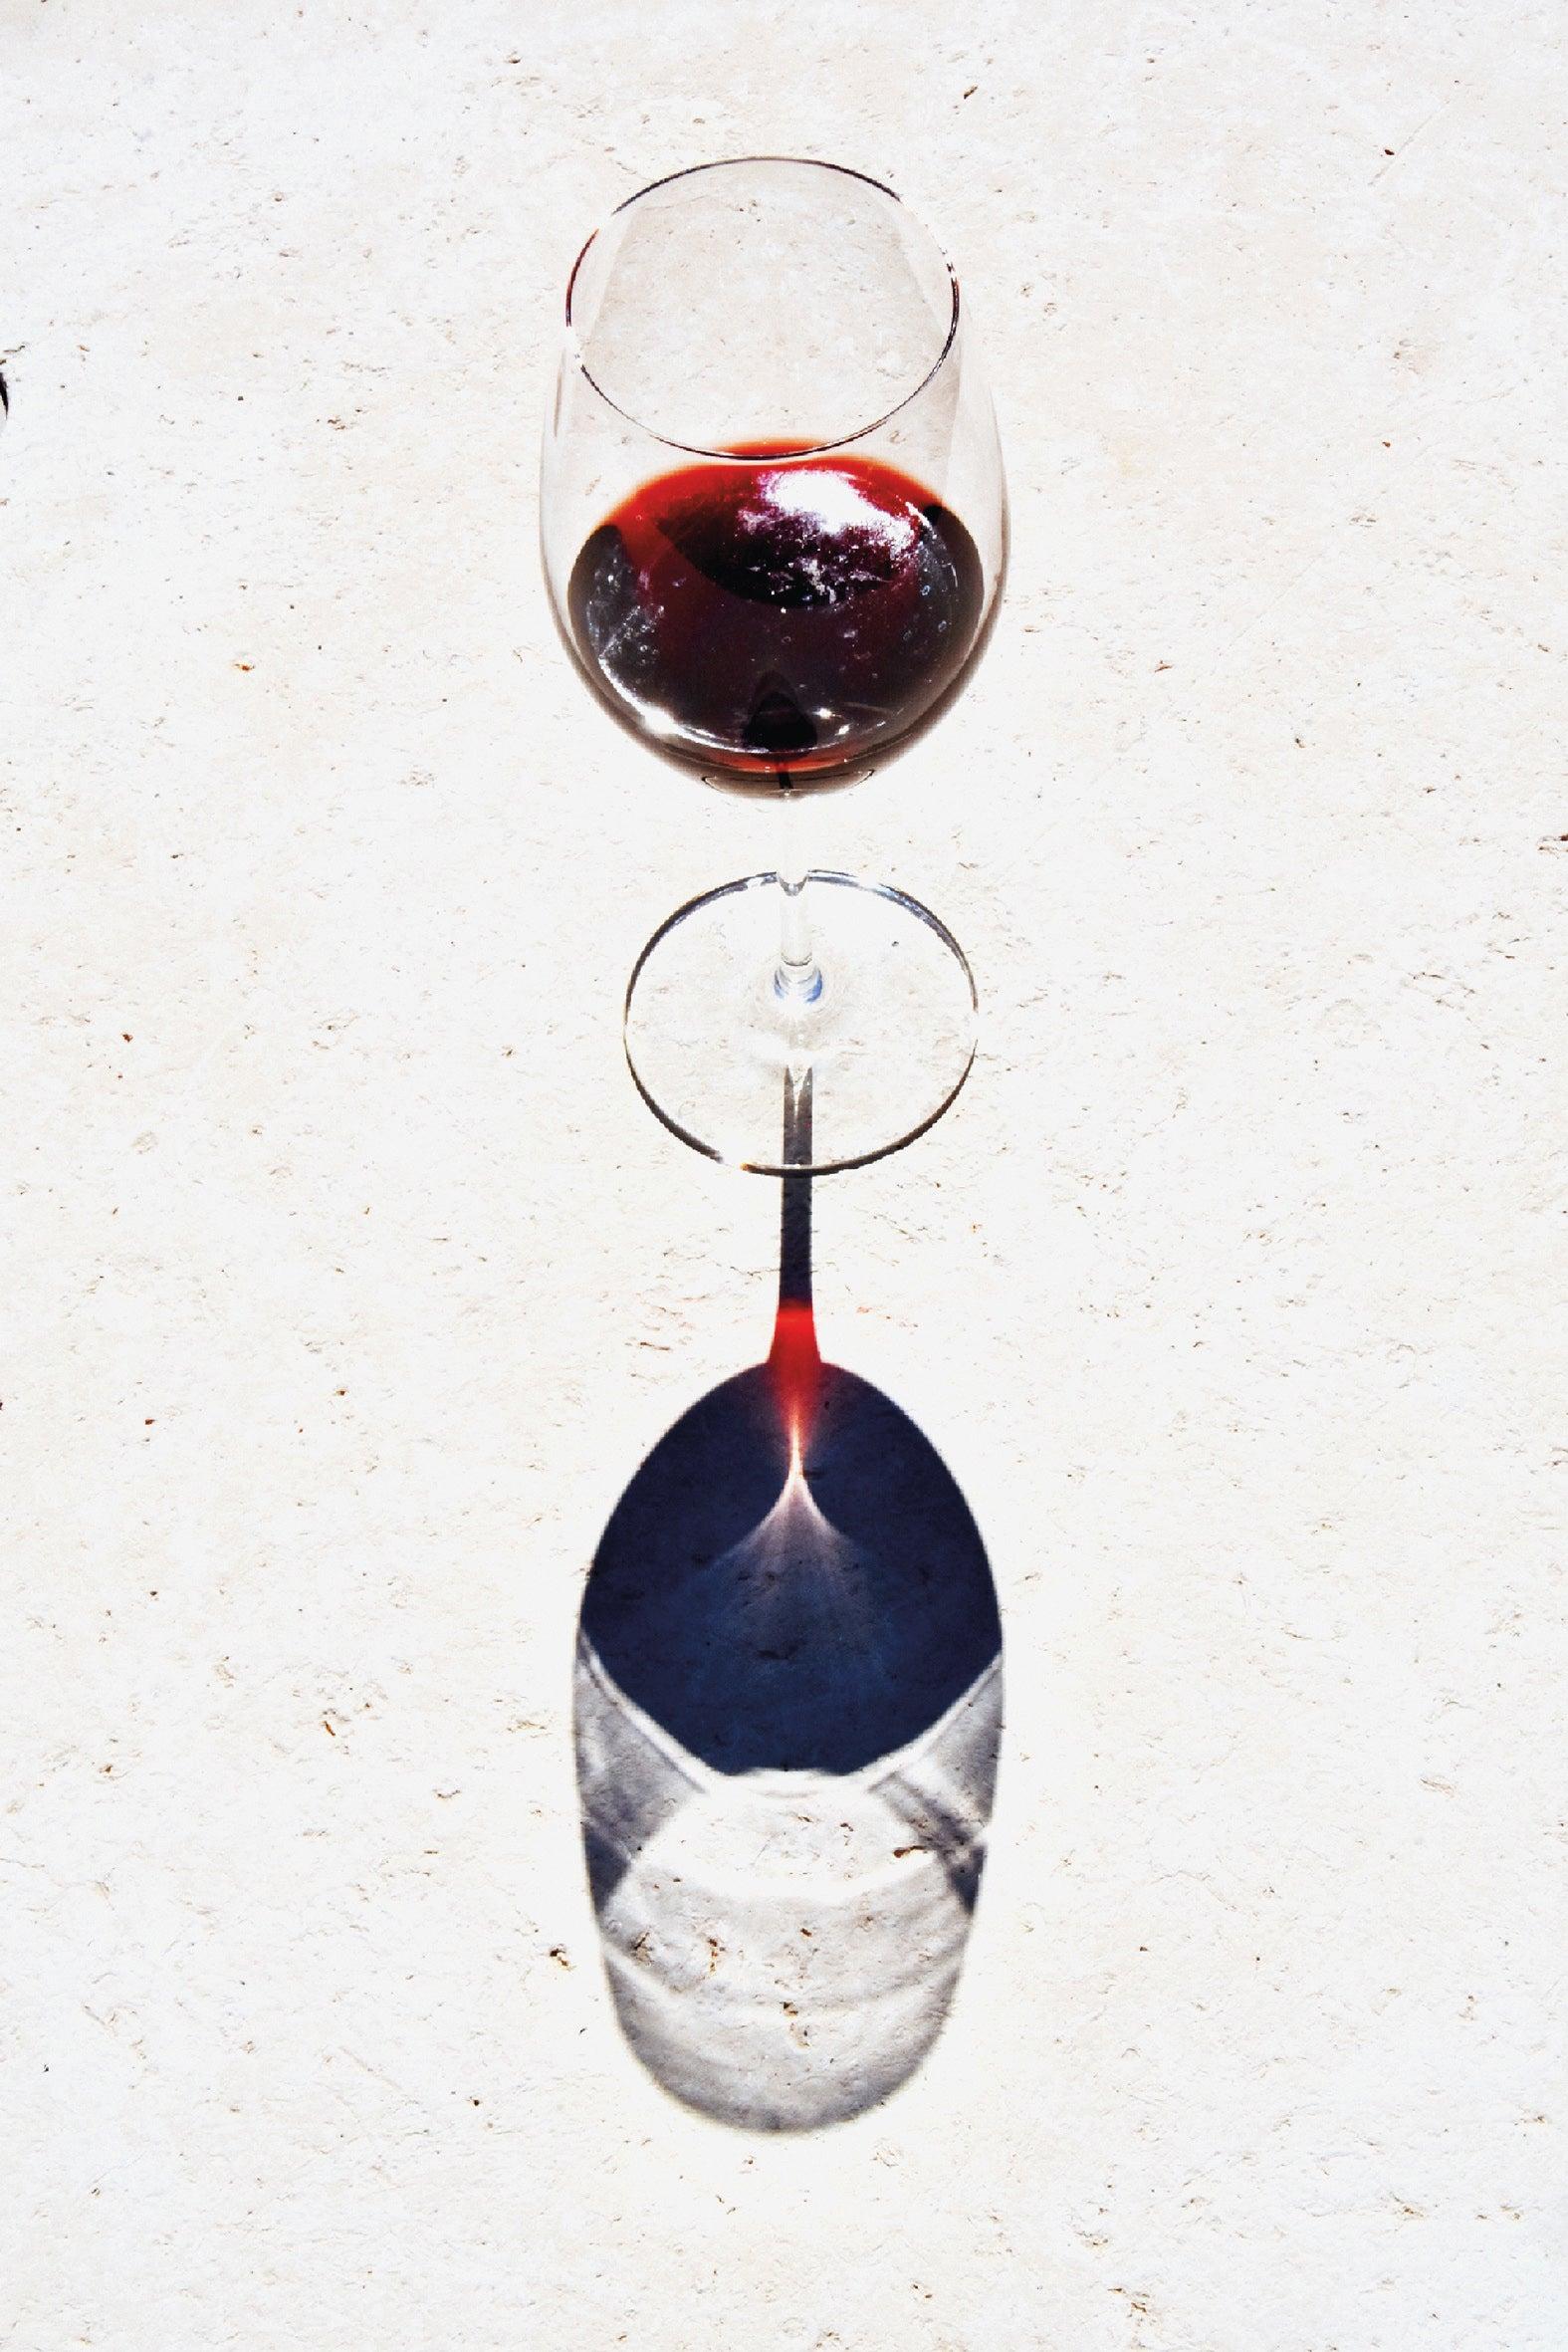 Wine's secret ingredient? Slowly crumbling rocks